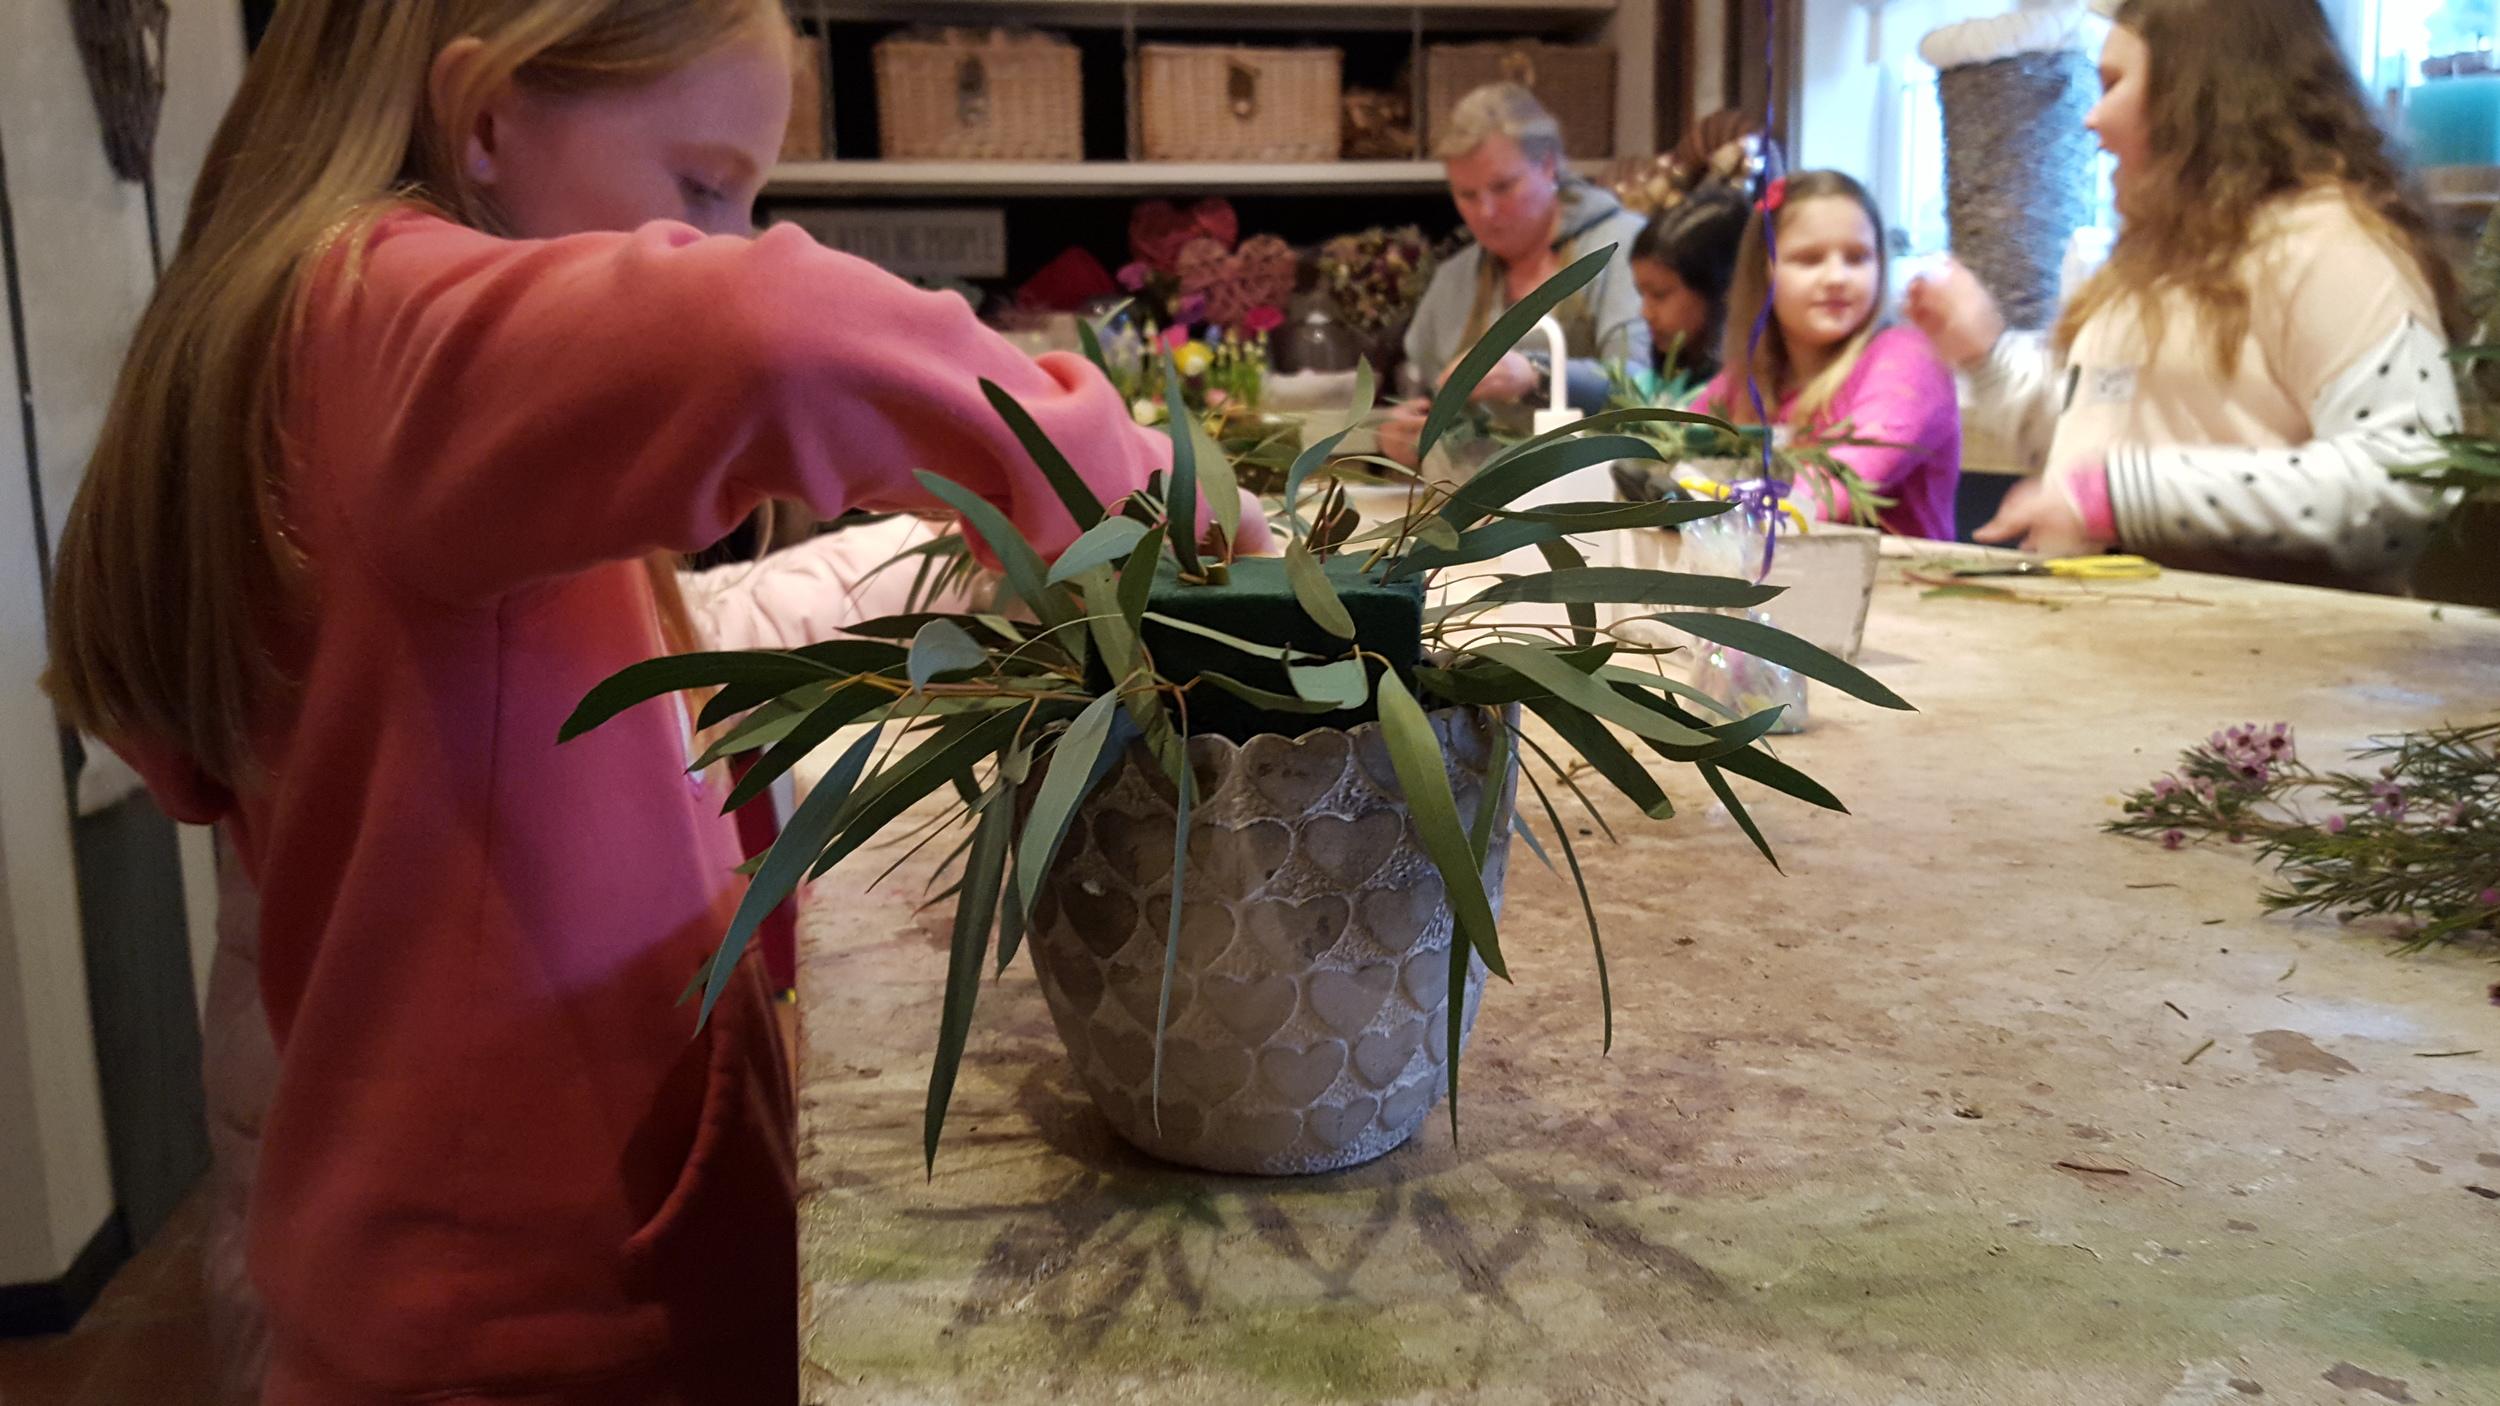 All in One Season Dutch Floral party. Adding foliage